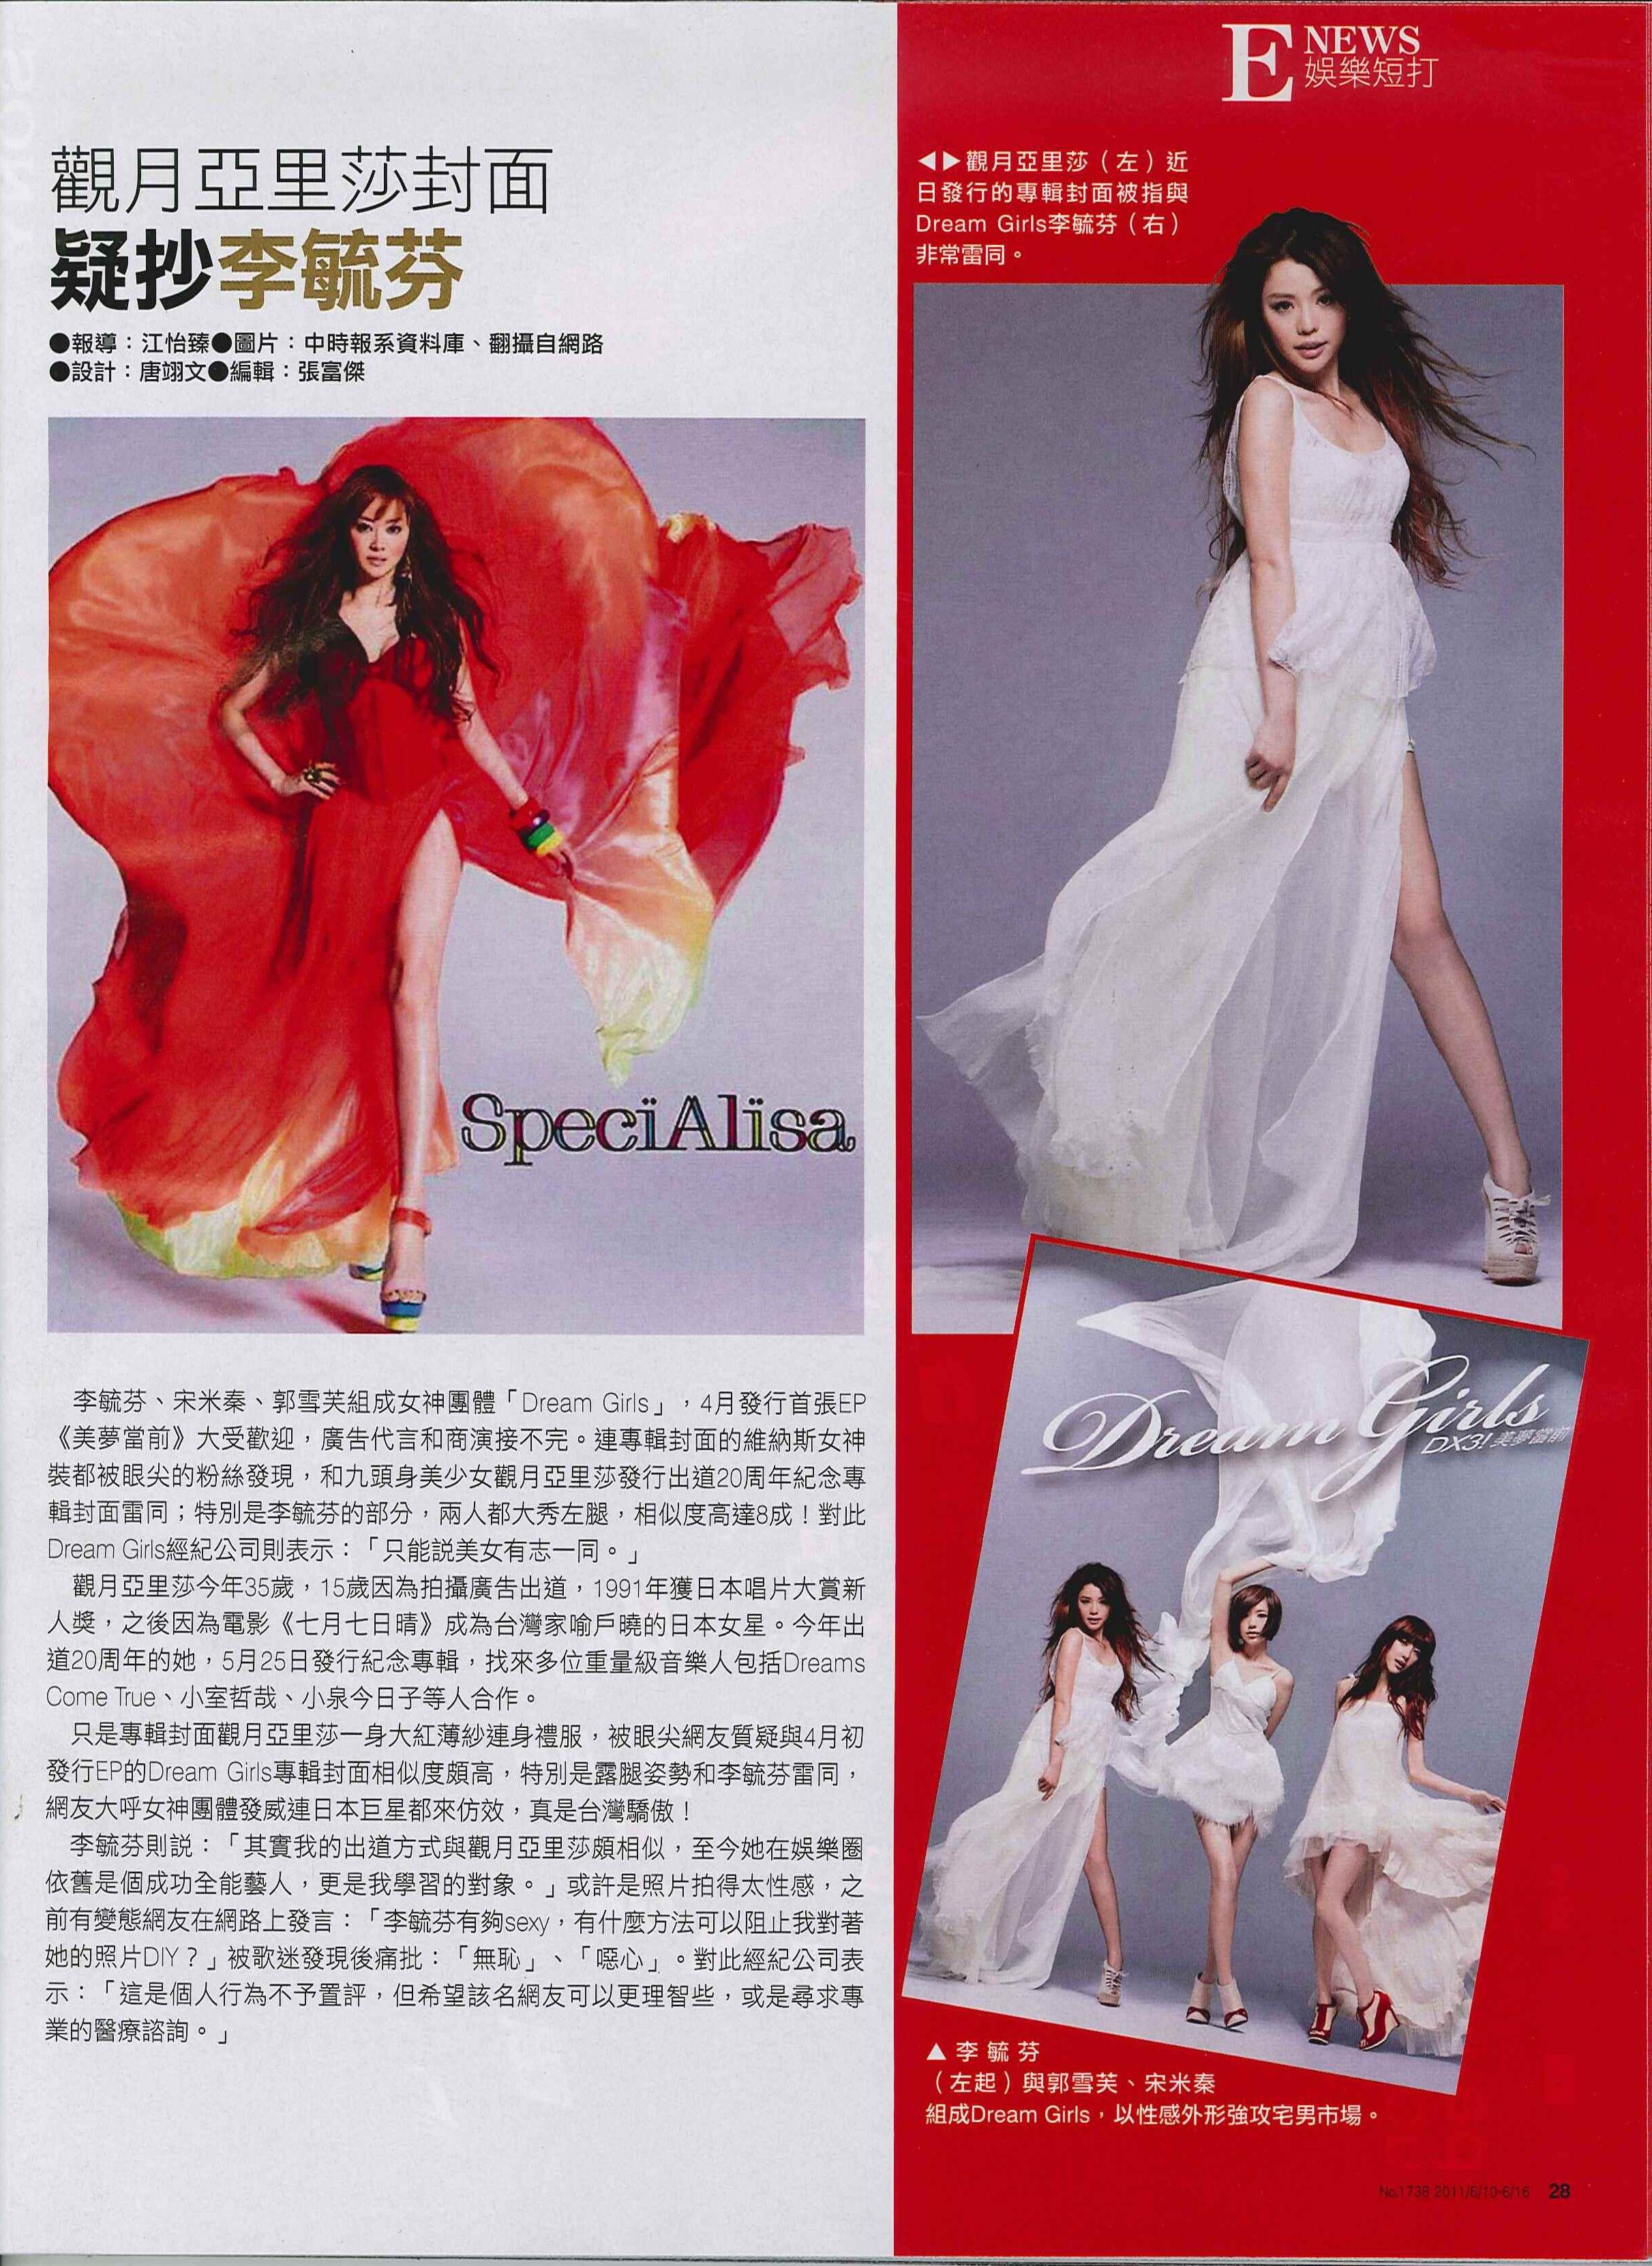 Dream Dirls-時報周刊 No.1738.jpg